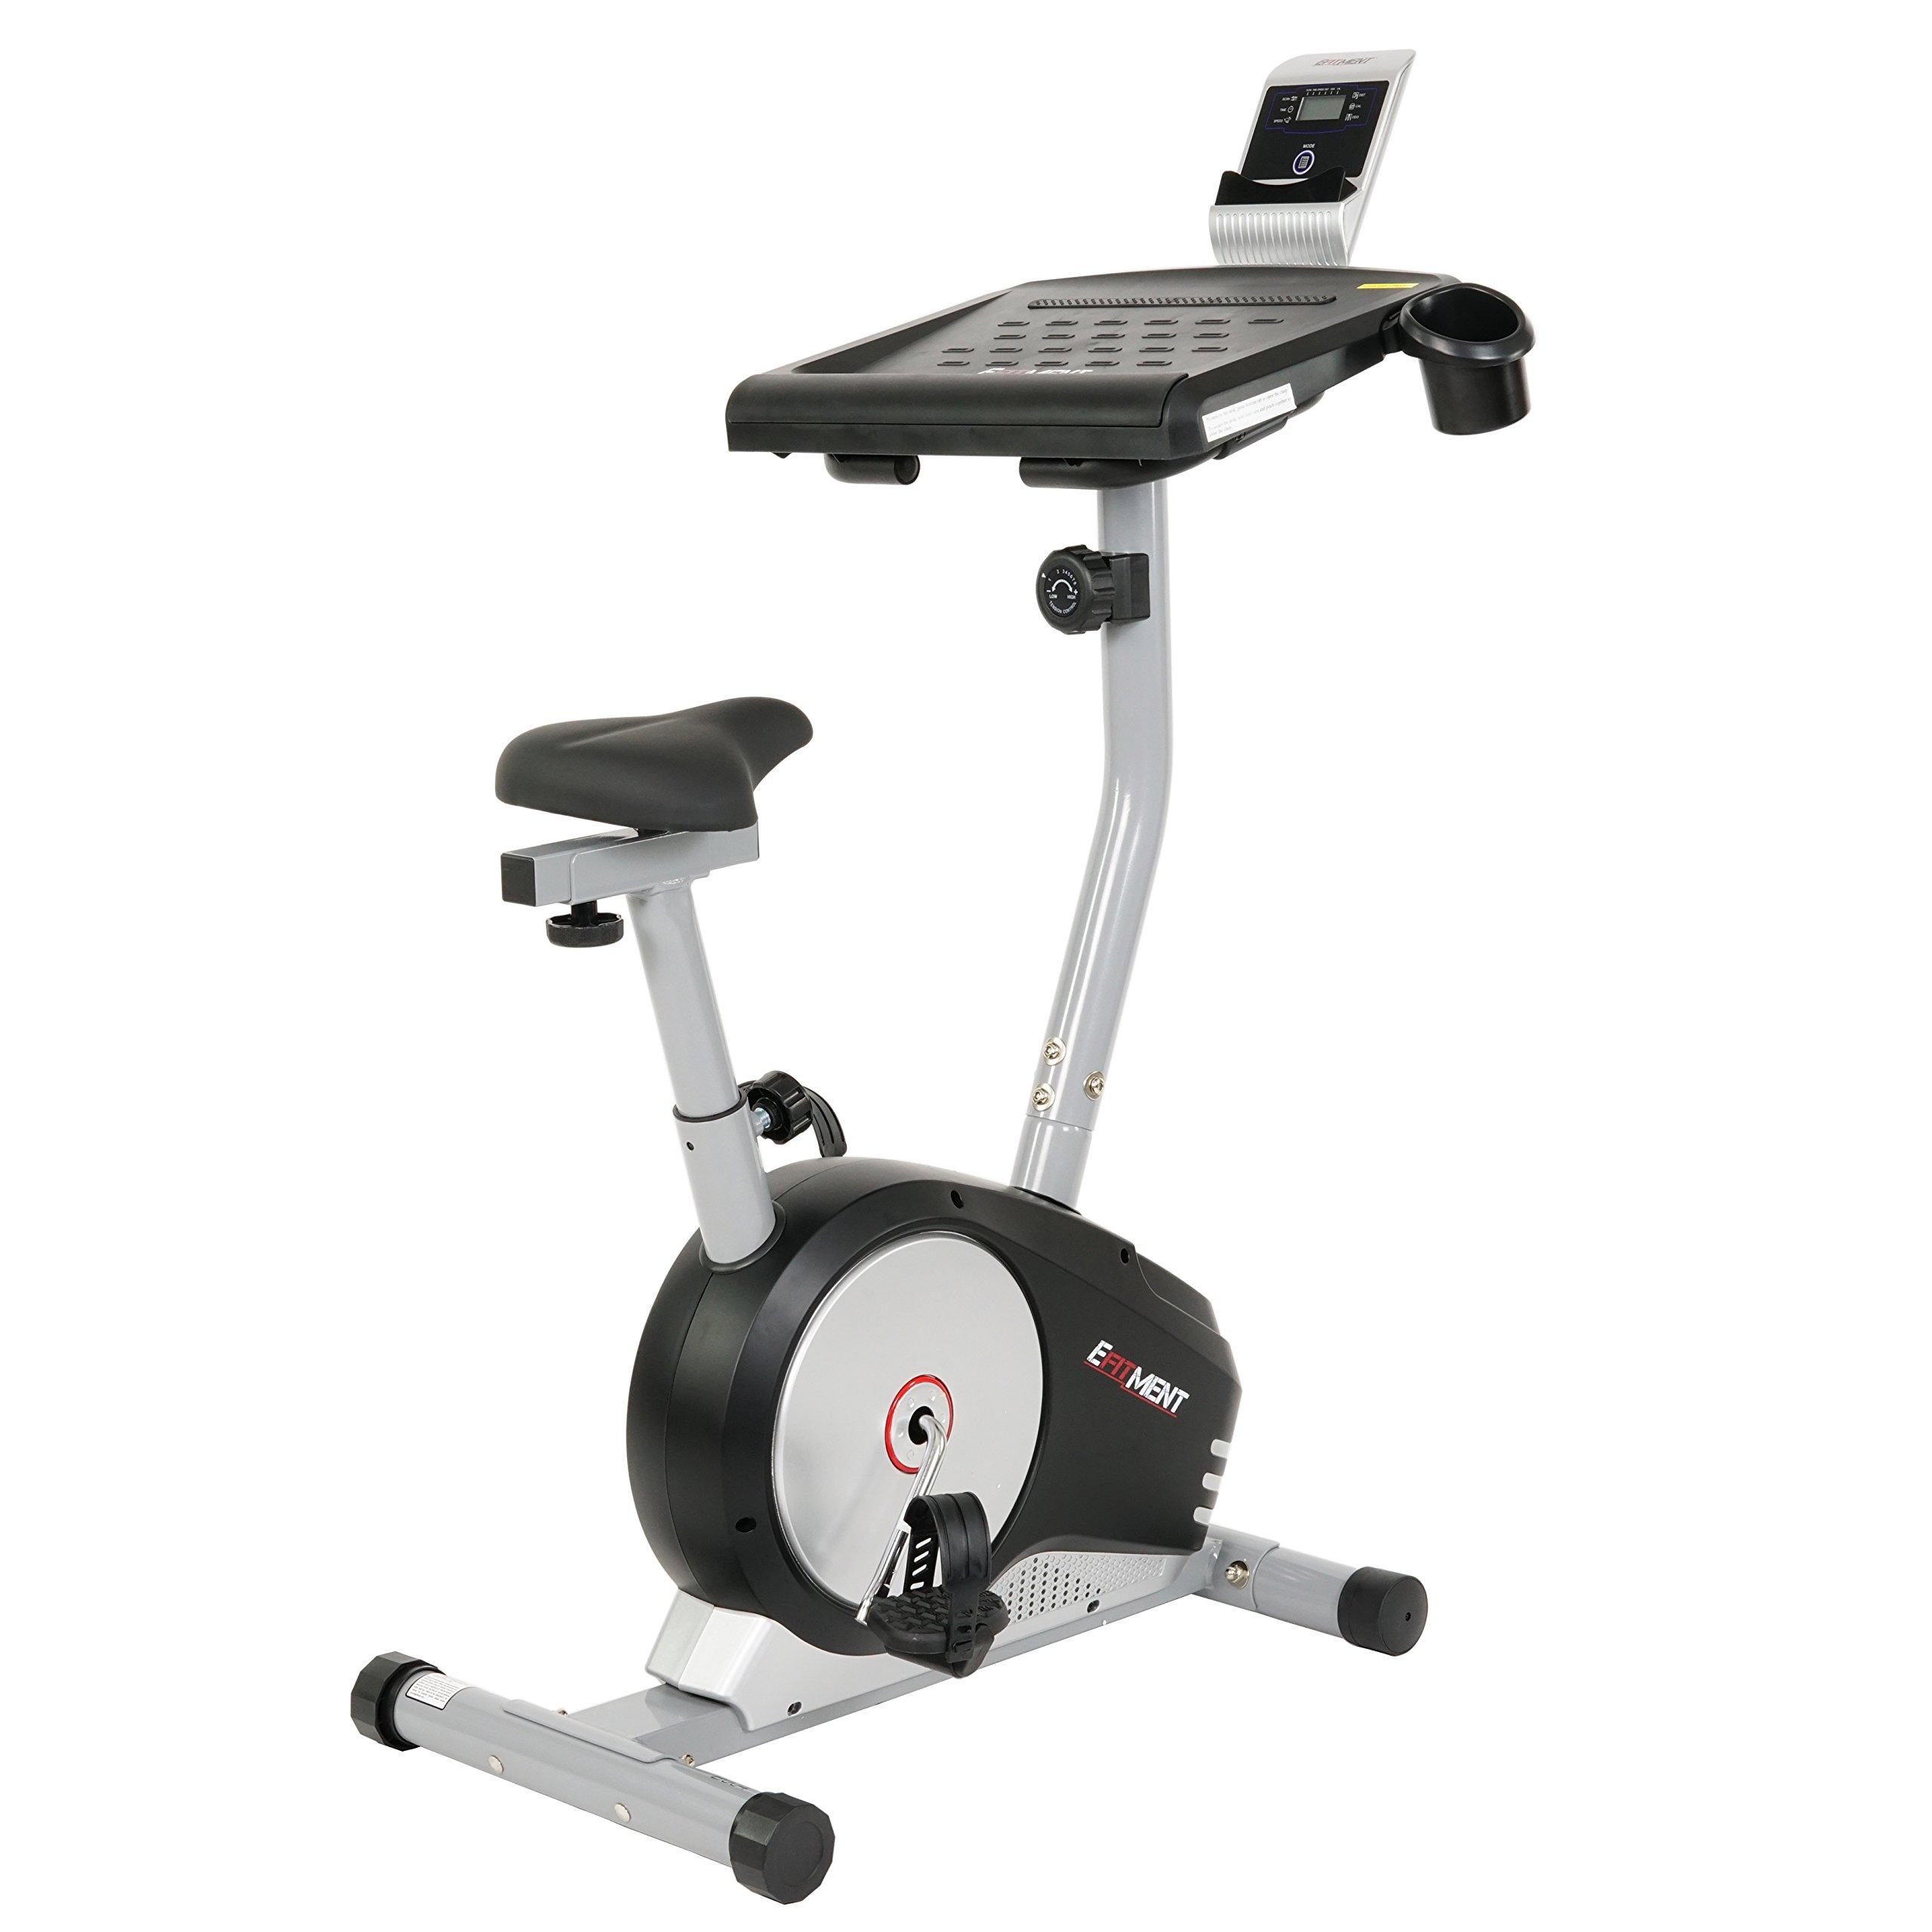 EFITMENT Workstation Desk Exercise Upright Bike, Desk Bike w/Table - B004